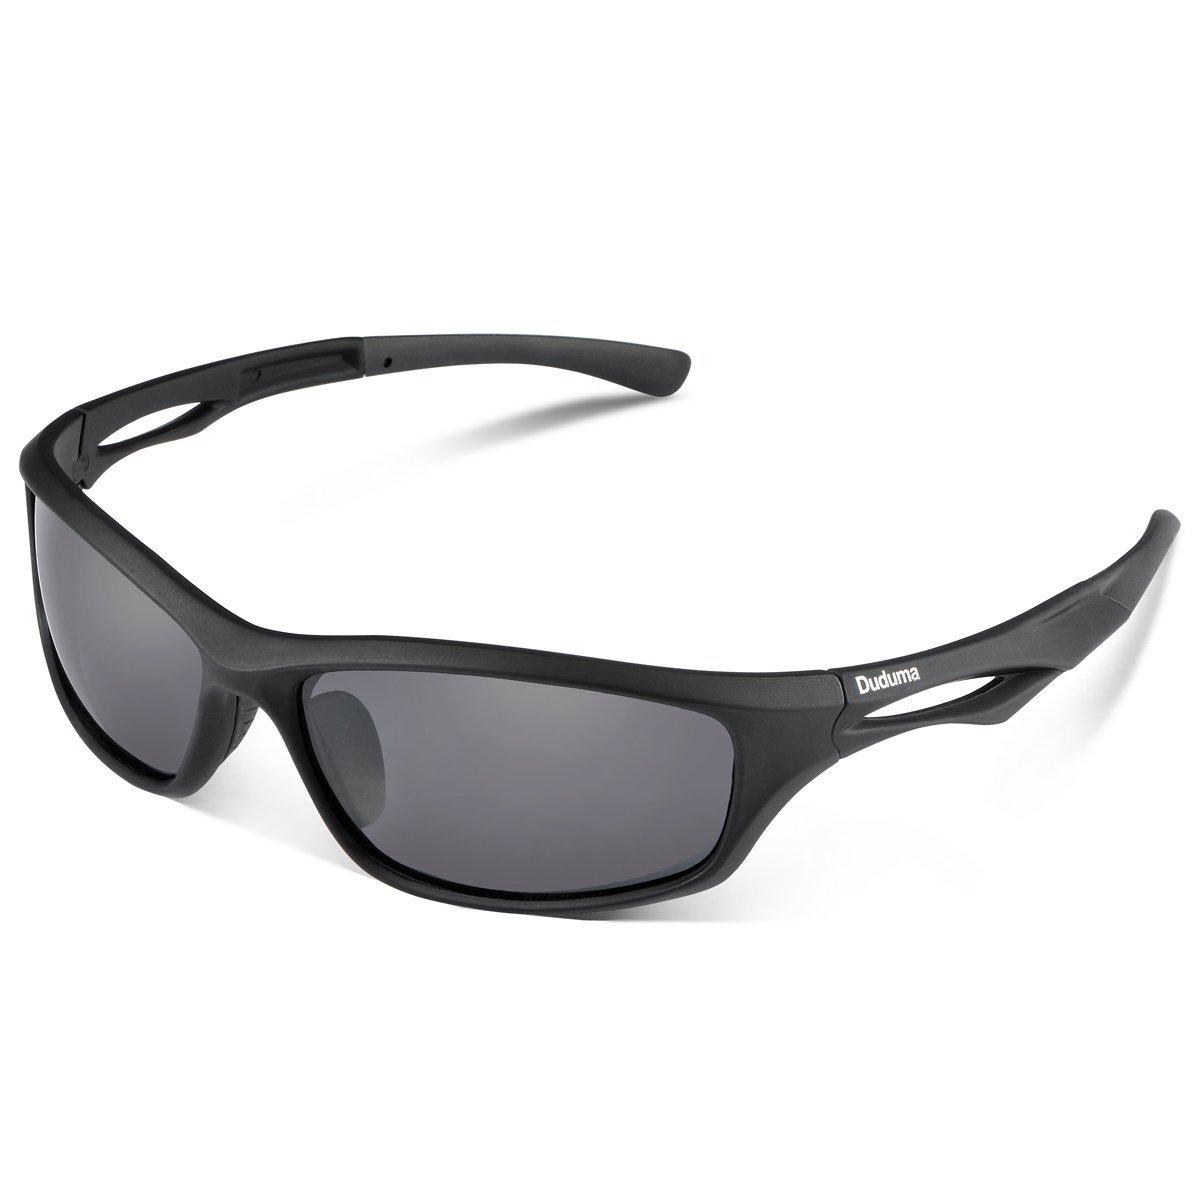 Duduma Polarized Sports Sunglasses for men women Baseball Running Cycling Fishing Golf Tr90 Durable Frame [Black Matte Frame With Black Lens] - $10.99 AC FS